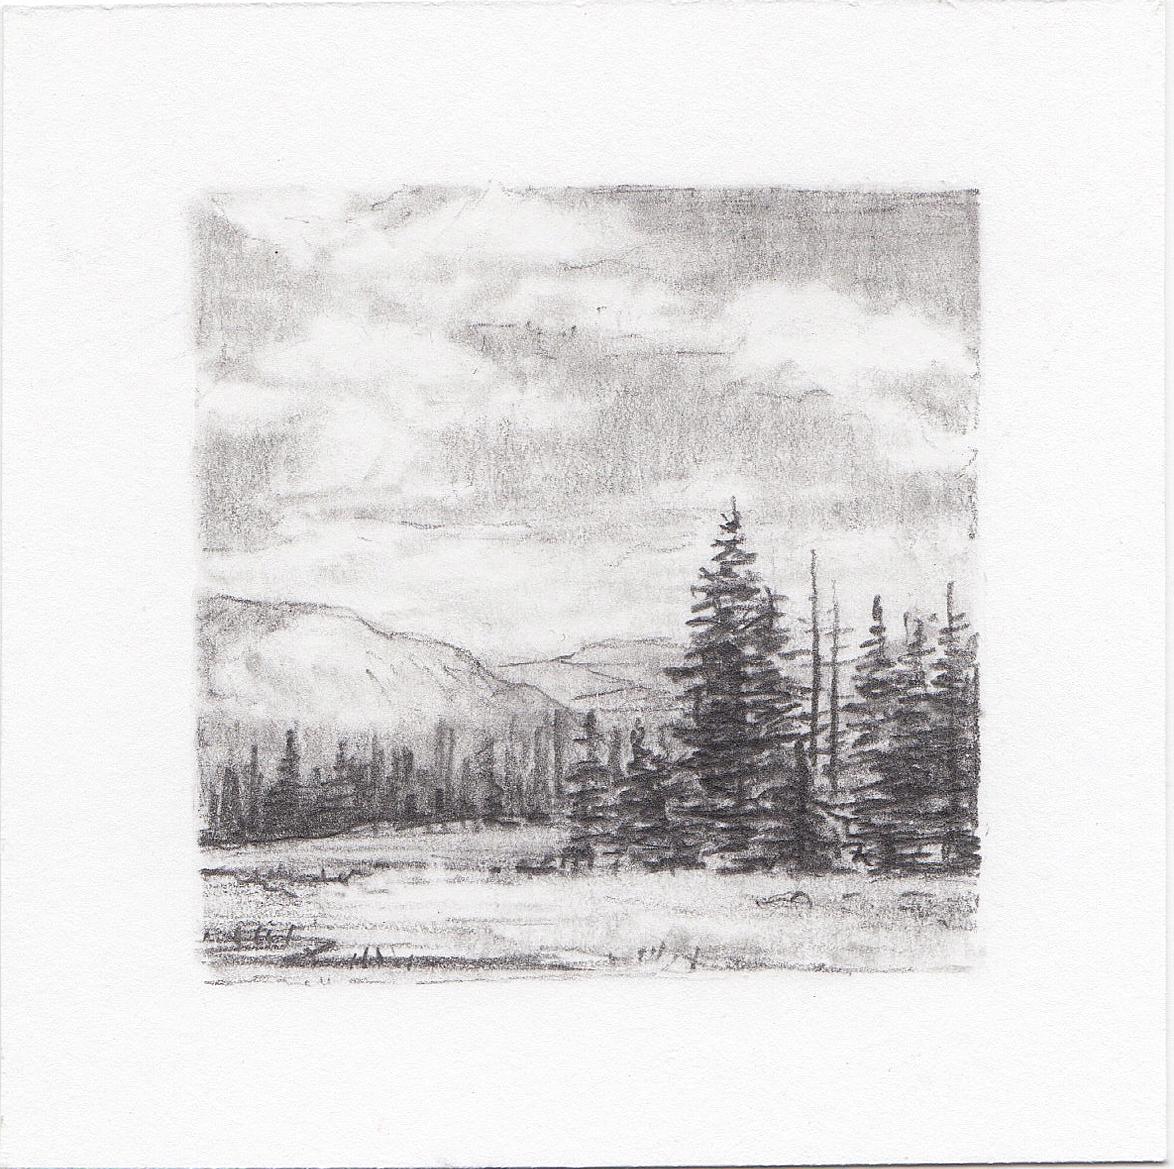 #9 Cuberant Lakes Trail, Uinta Mountains, Utah | 3x3 | graphite